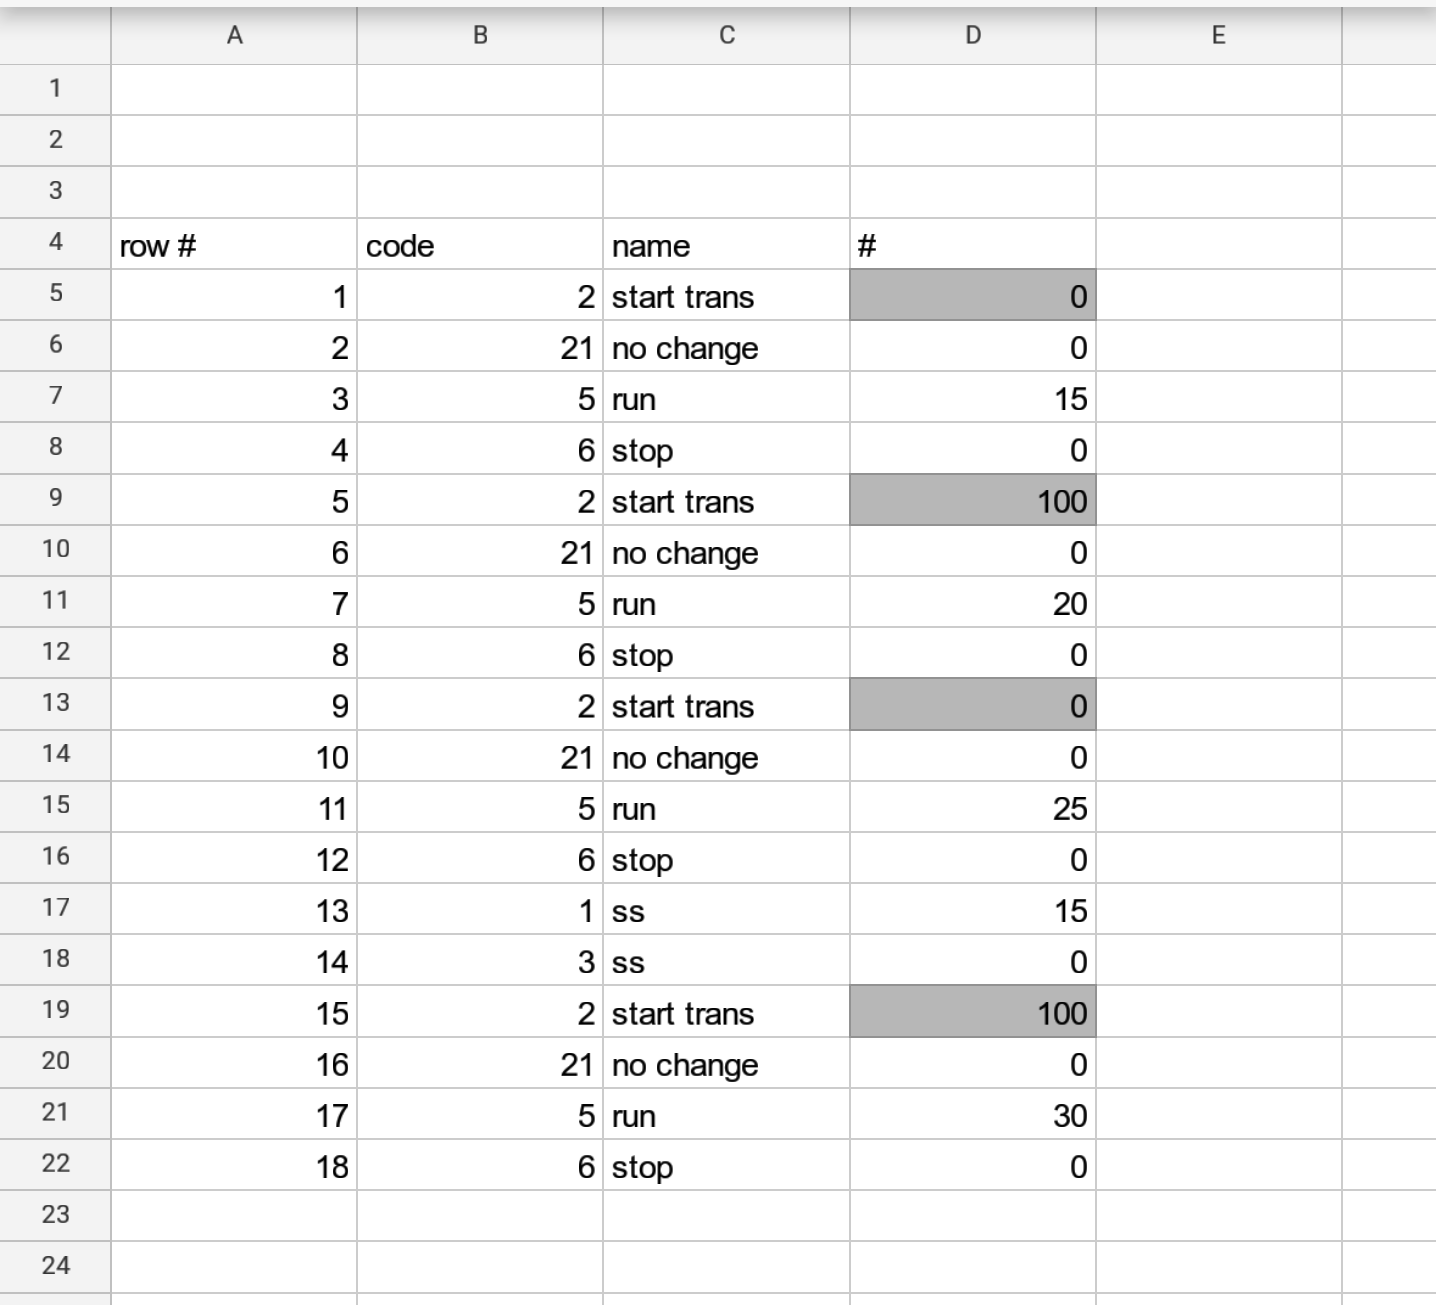 Excel Vba Find Match And Return Alternating Values